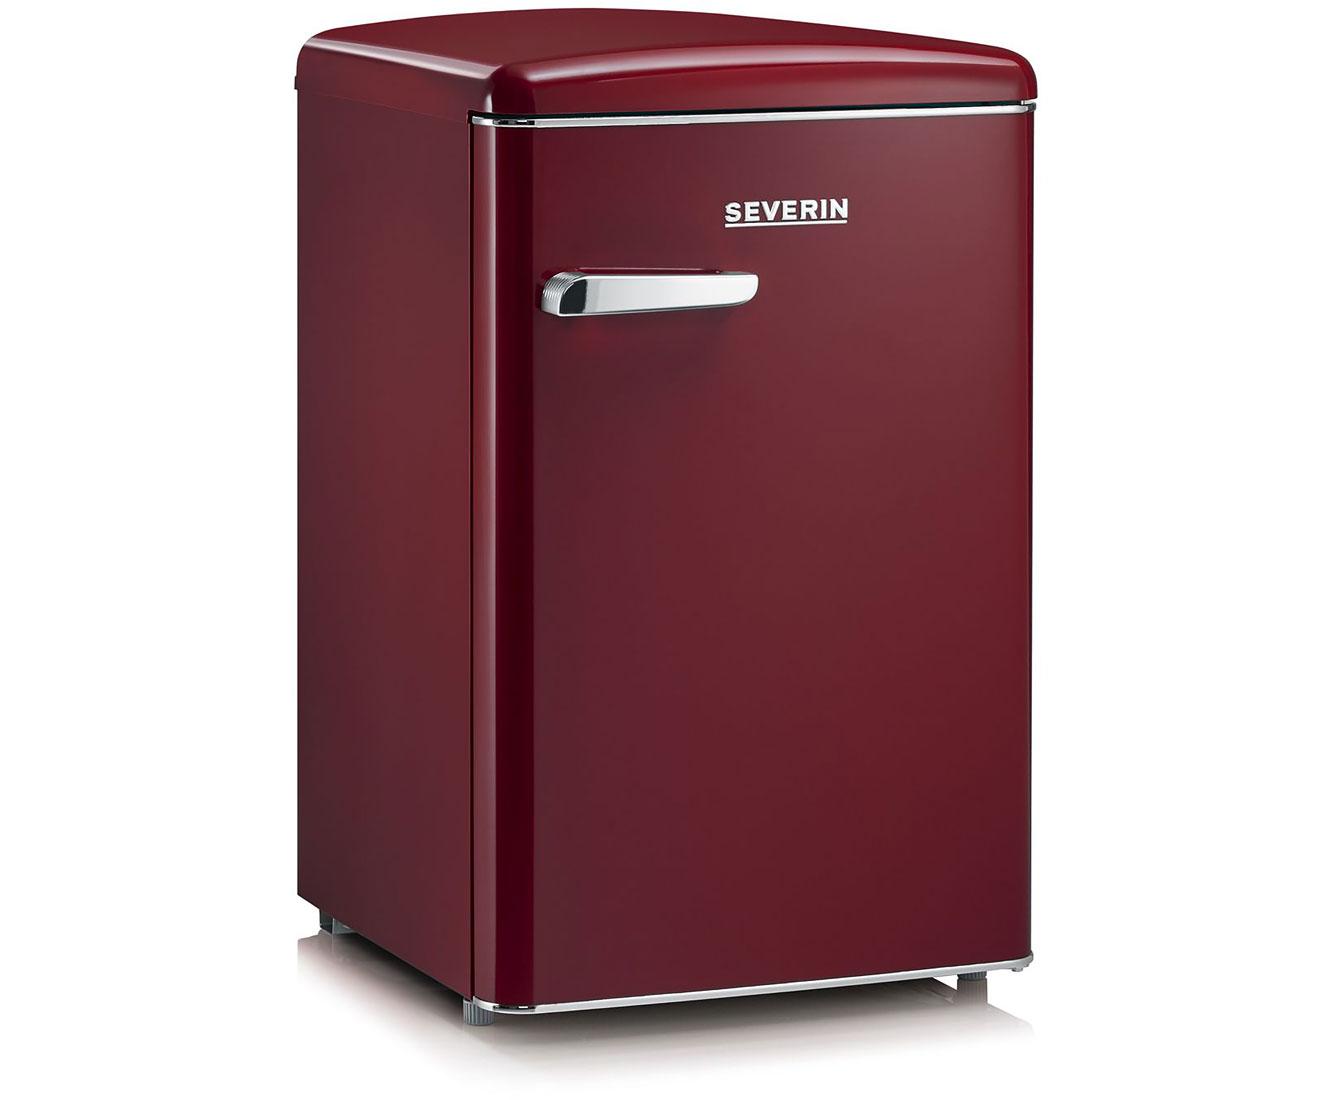 Retro Kühlschrank Severin : Severin rks 8831 kühlschrank mit gefrierfach bordeaux rot retro